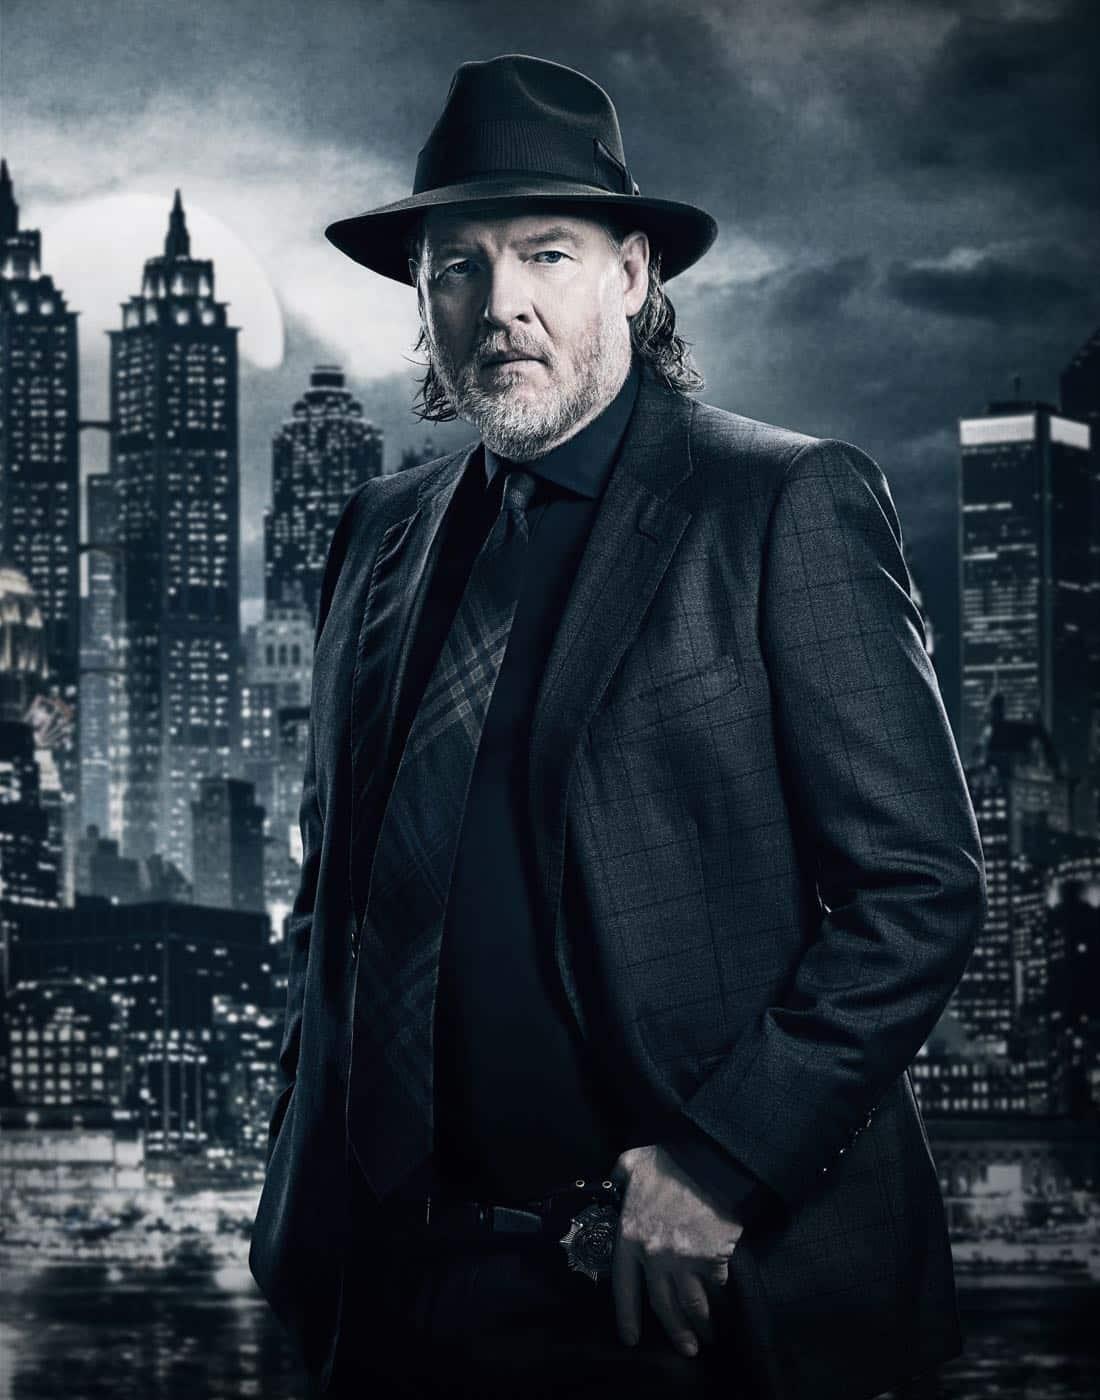 Donal Logue. Season 4 of GOTHAM